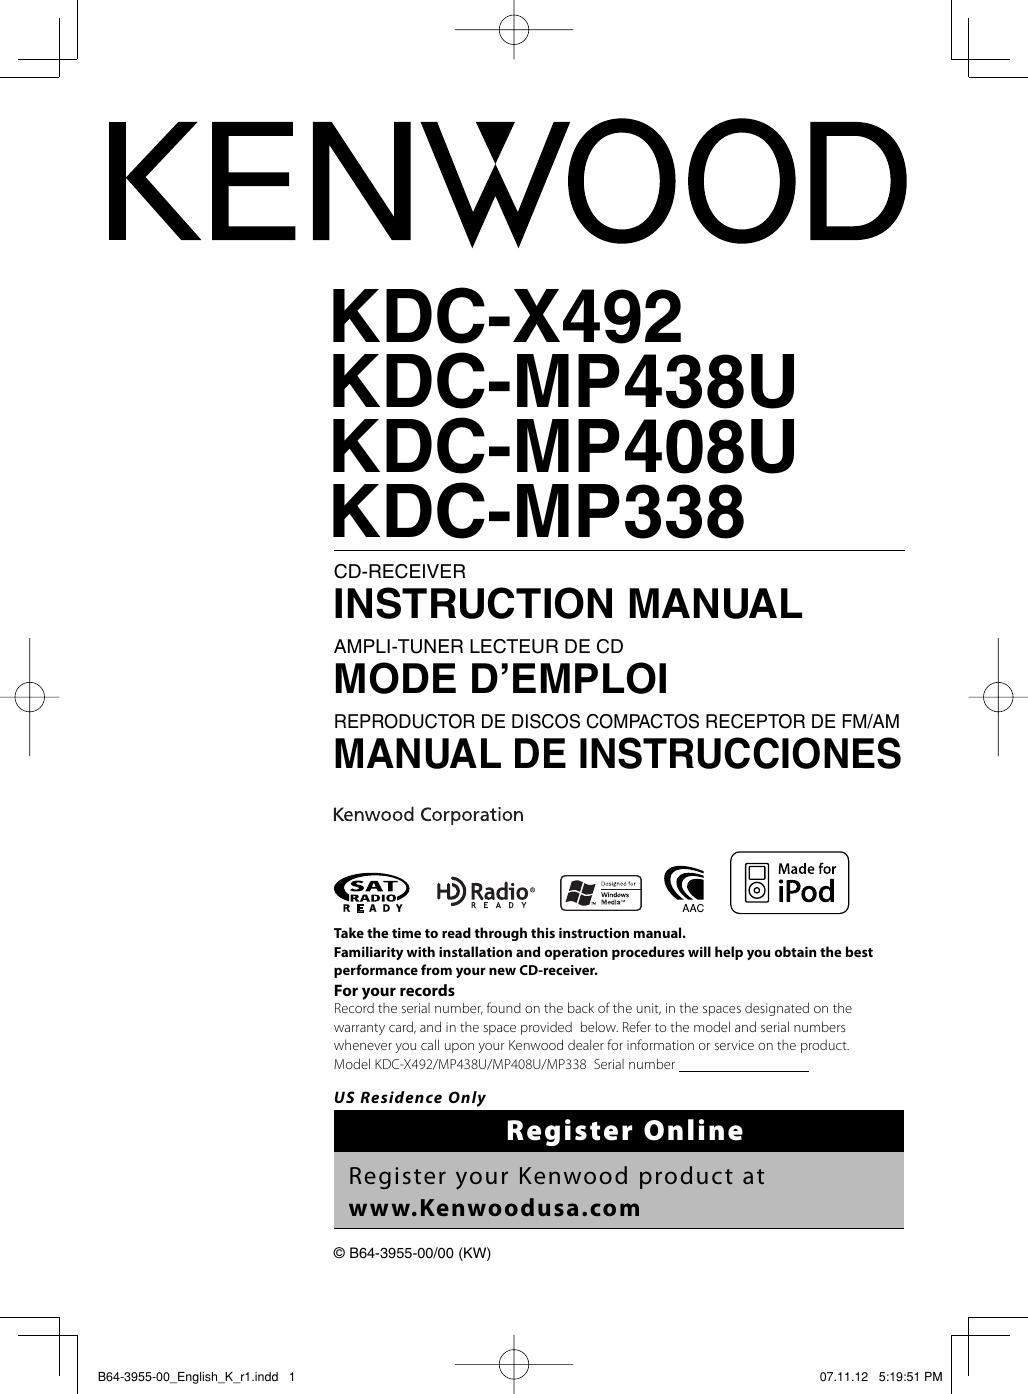 kenwood car stereo wiring diagrams kdc 492